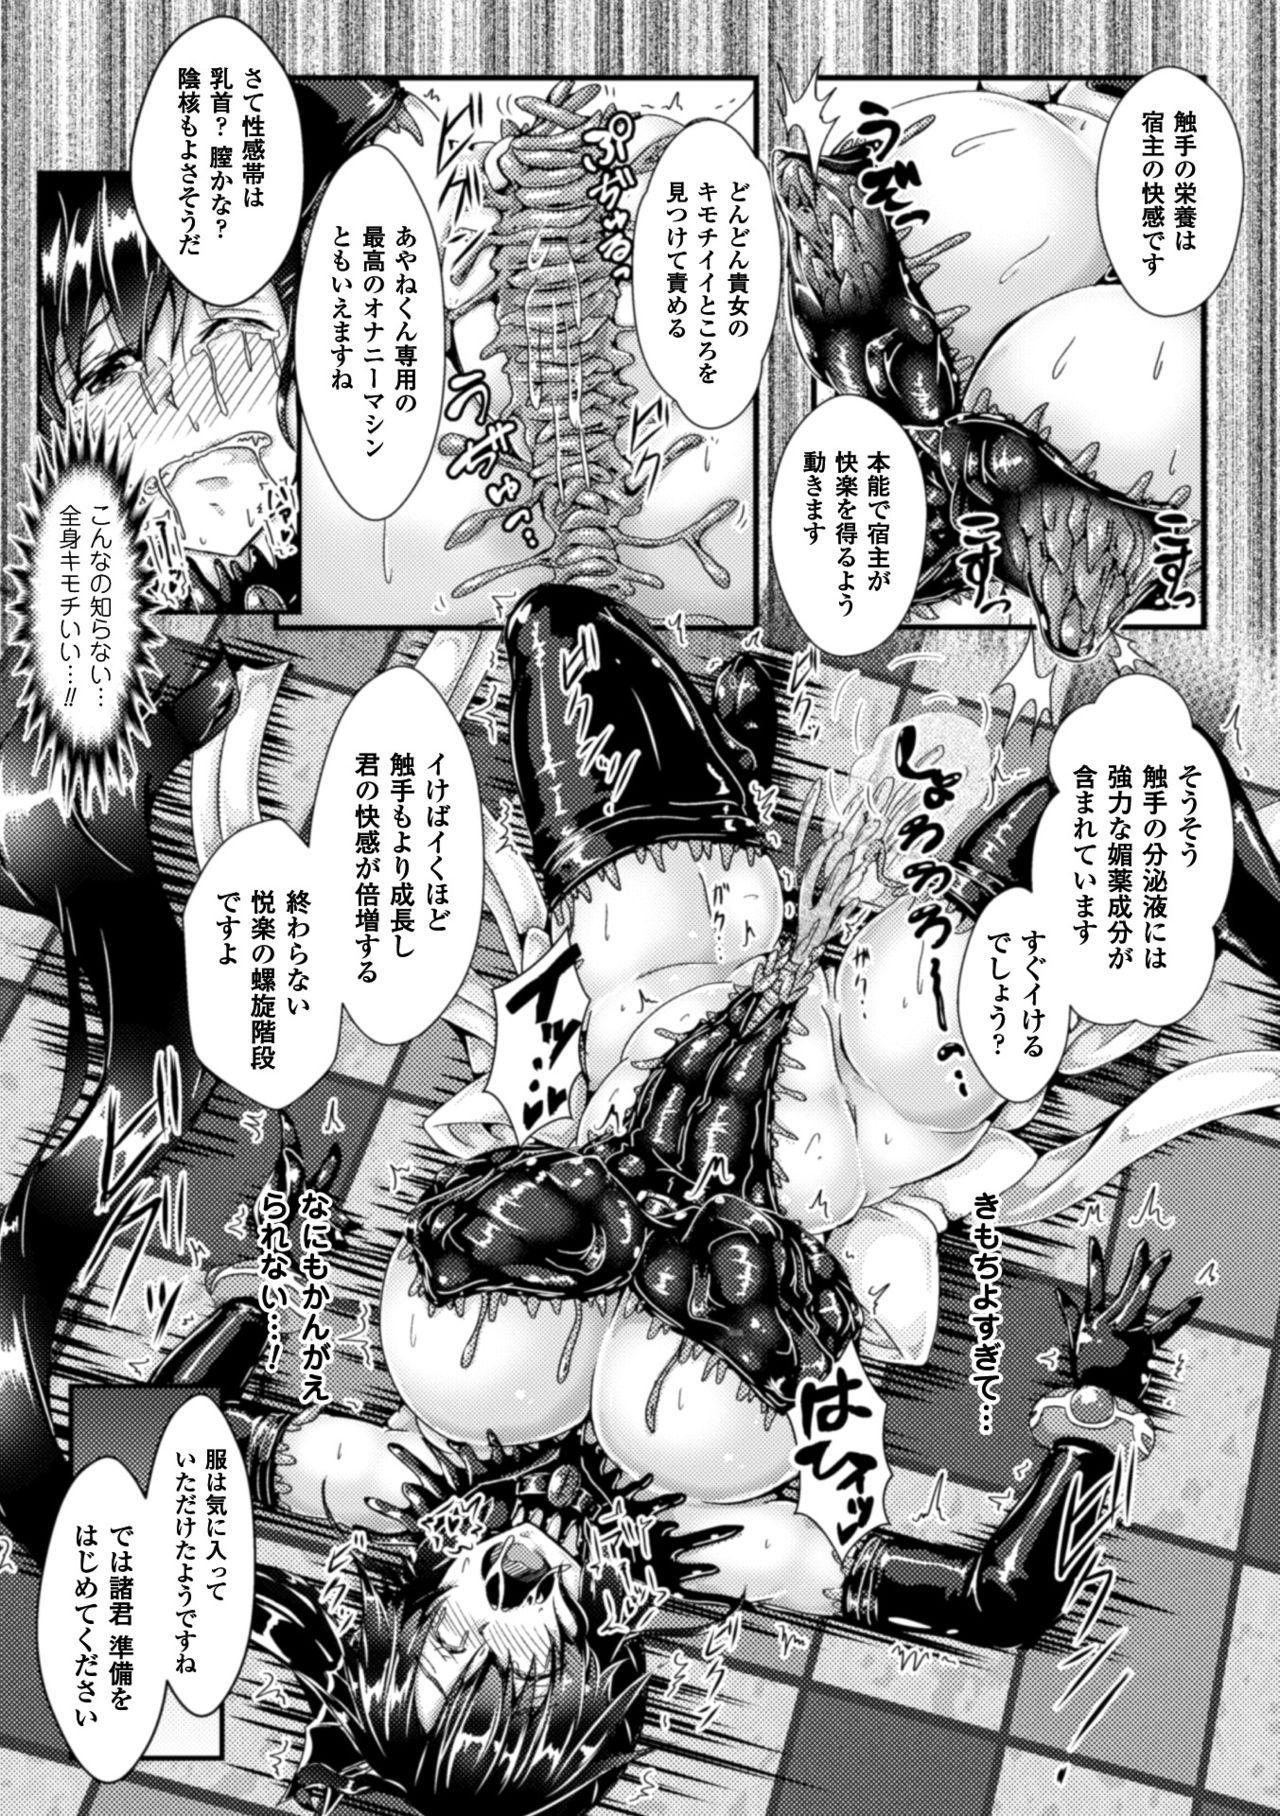 2D Comic Magazine Shokushu Yoroi ni Zenshin o Okasare Mugen Zecchou! Vol. 5 49